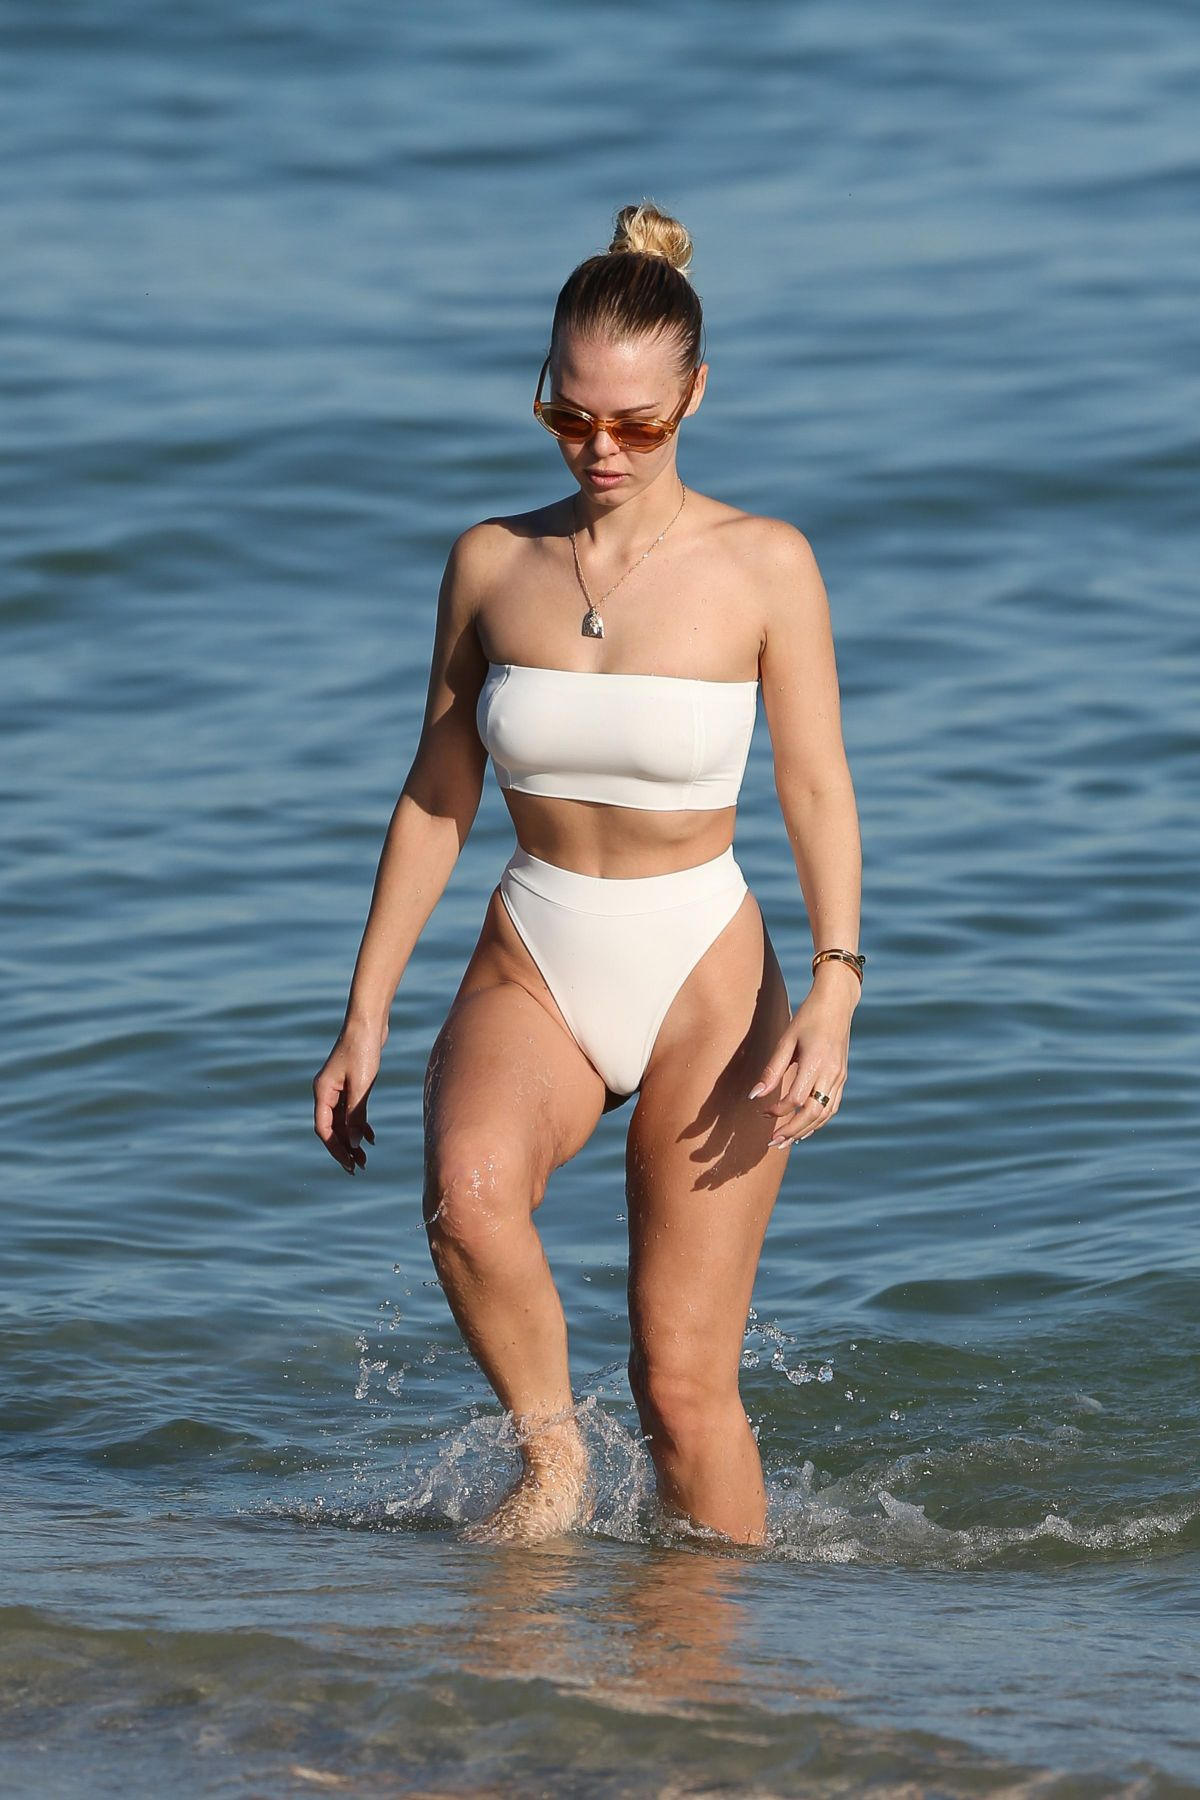 2019 Bianca Elouise nudes (74 photos), Ass, Hot, Instagram, braless 2019